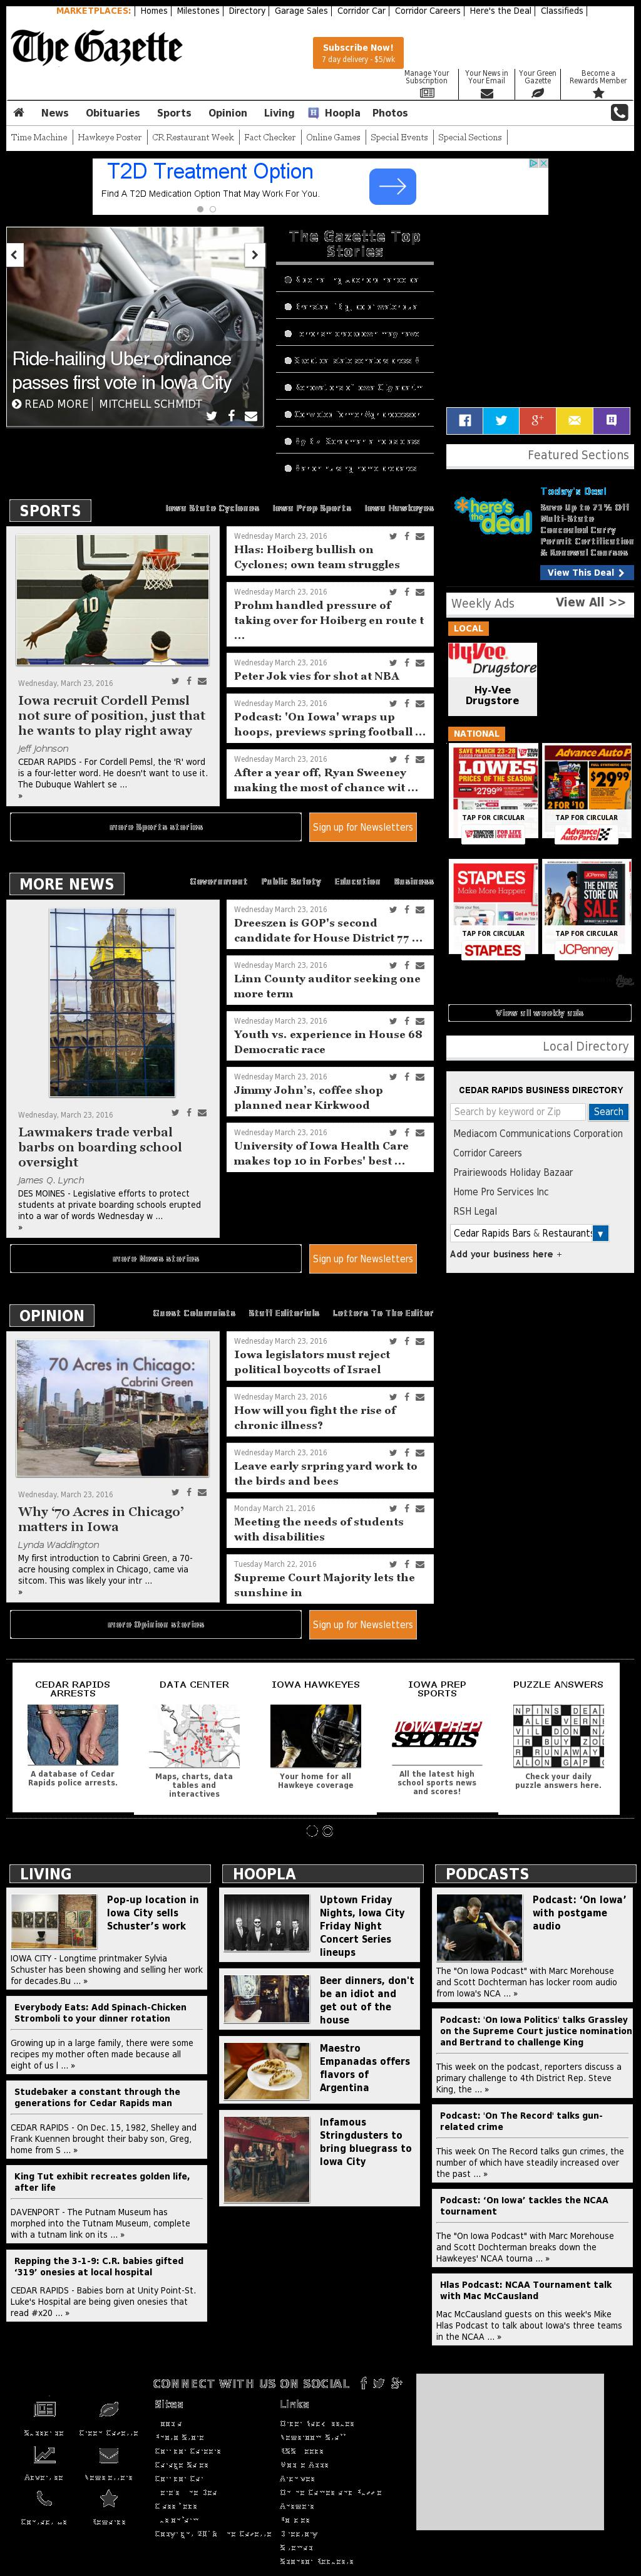 The (Cedar Rapids) Gazette at Thursday March 24, 2016, 4:04 a.m. UTC